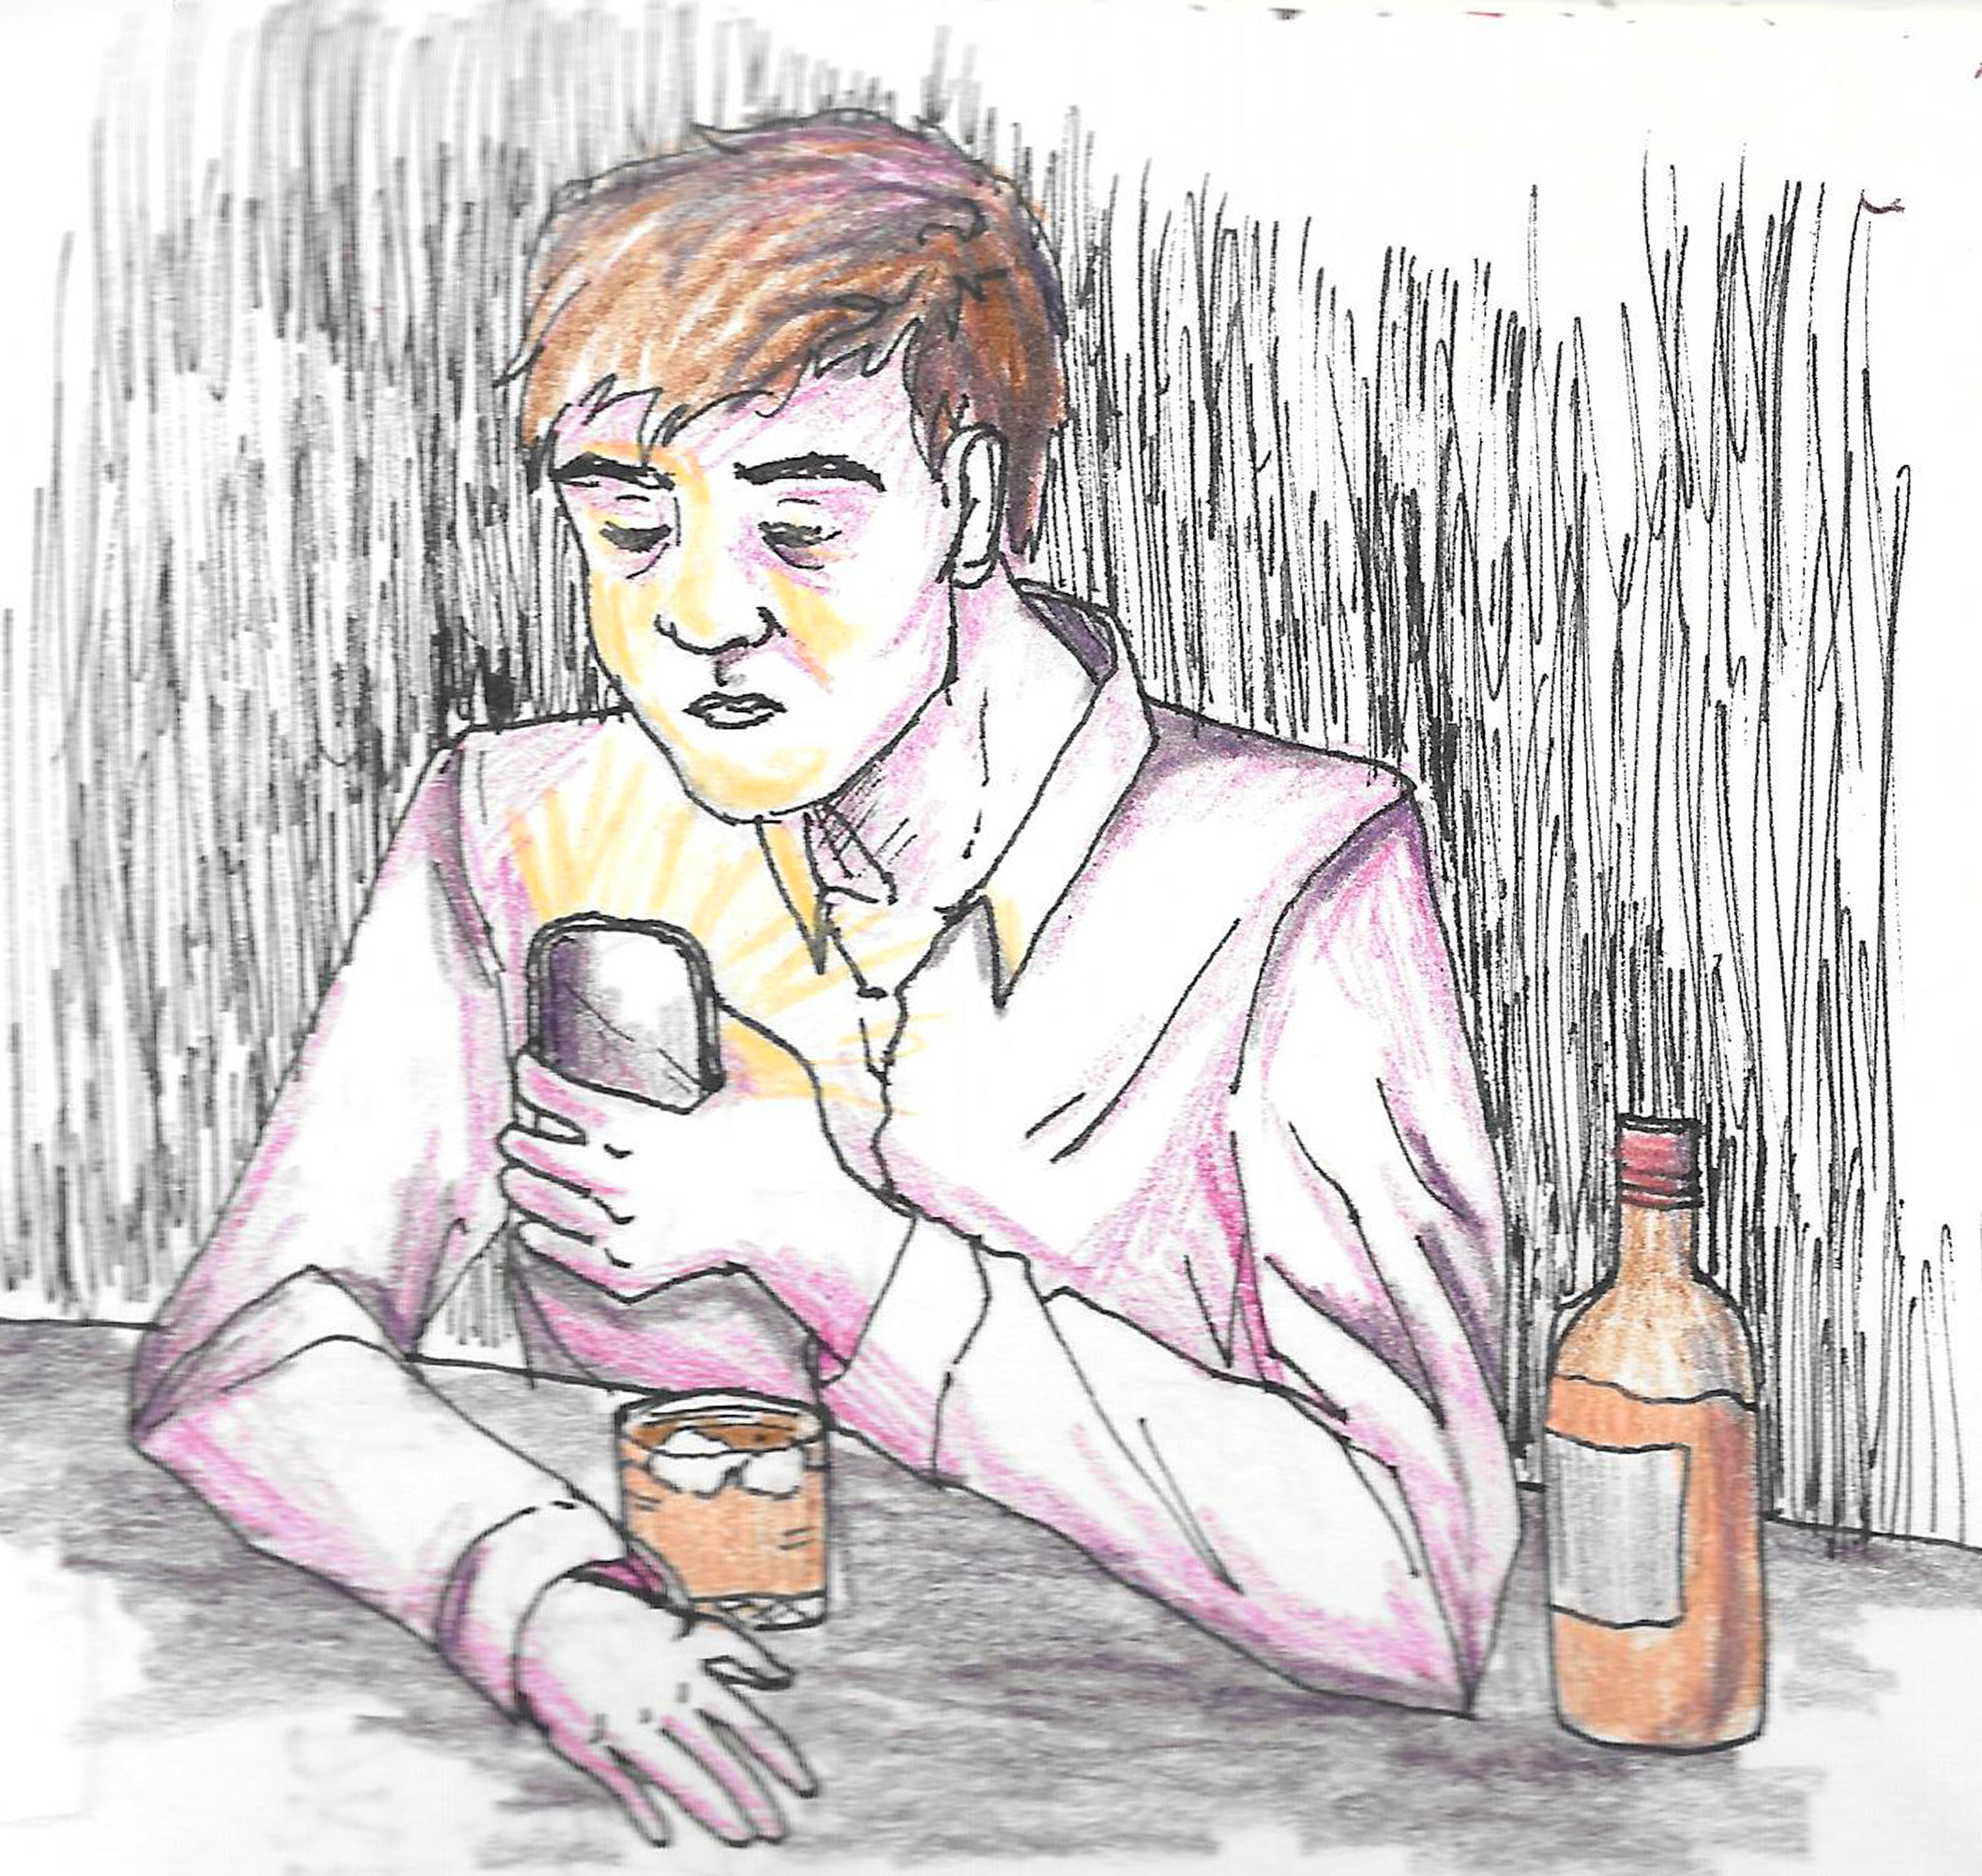 Illustration by Sasha Costello